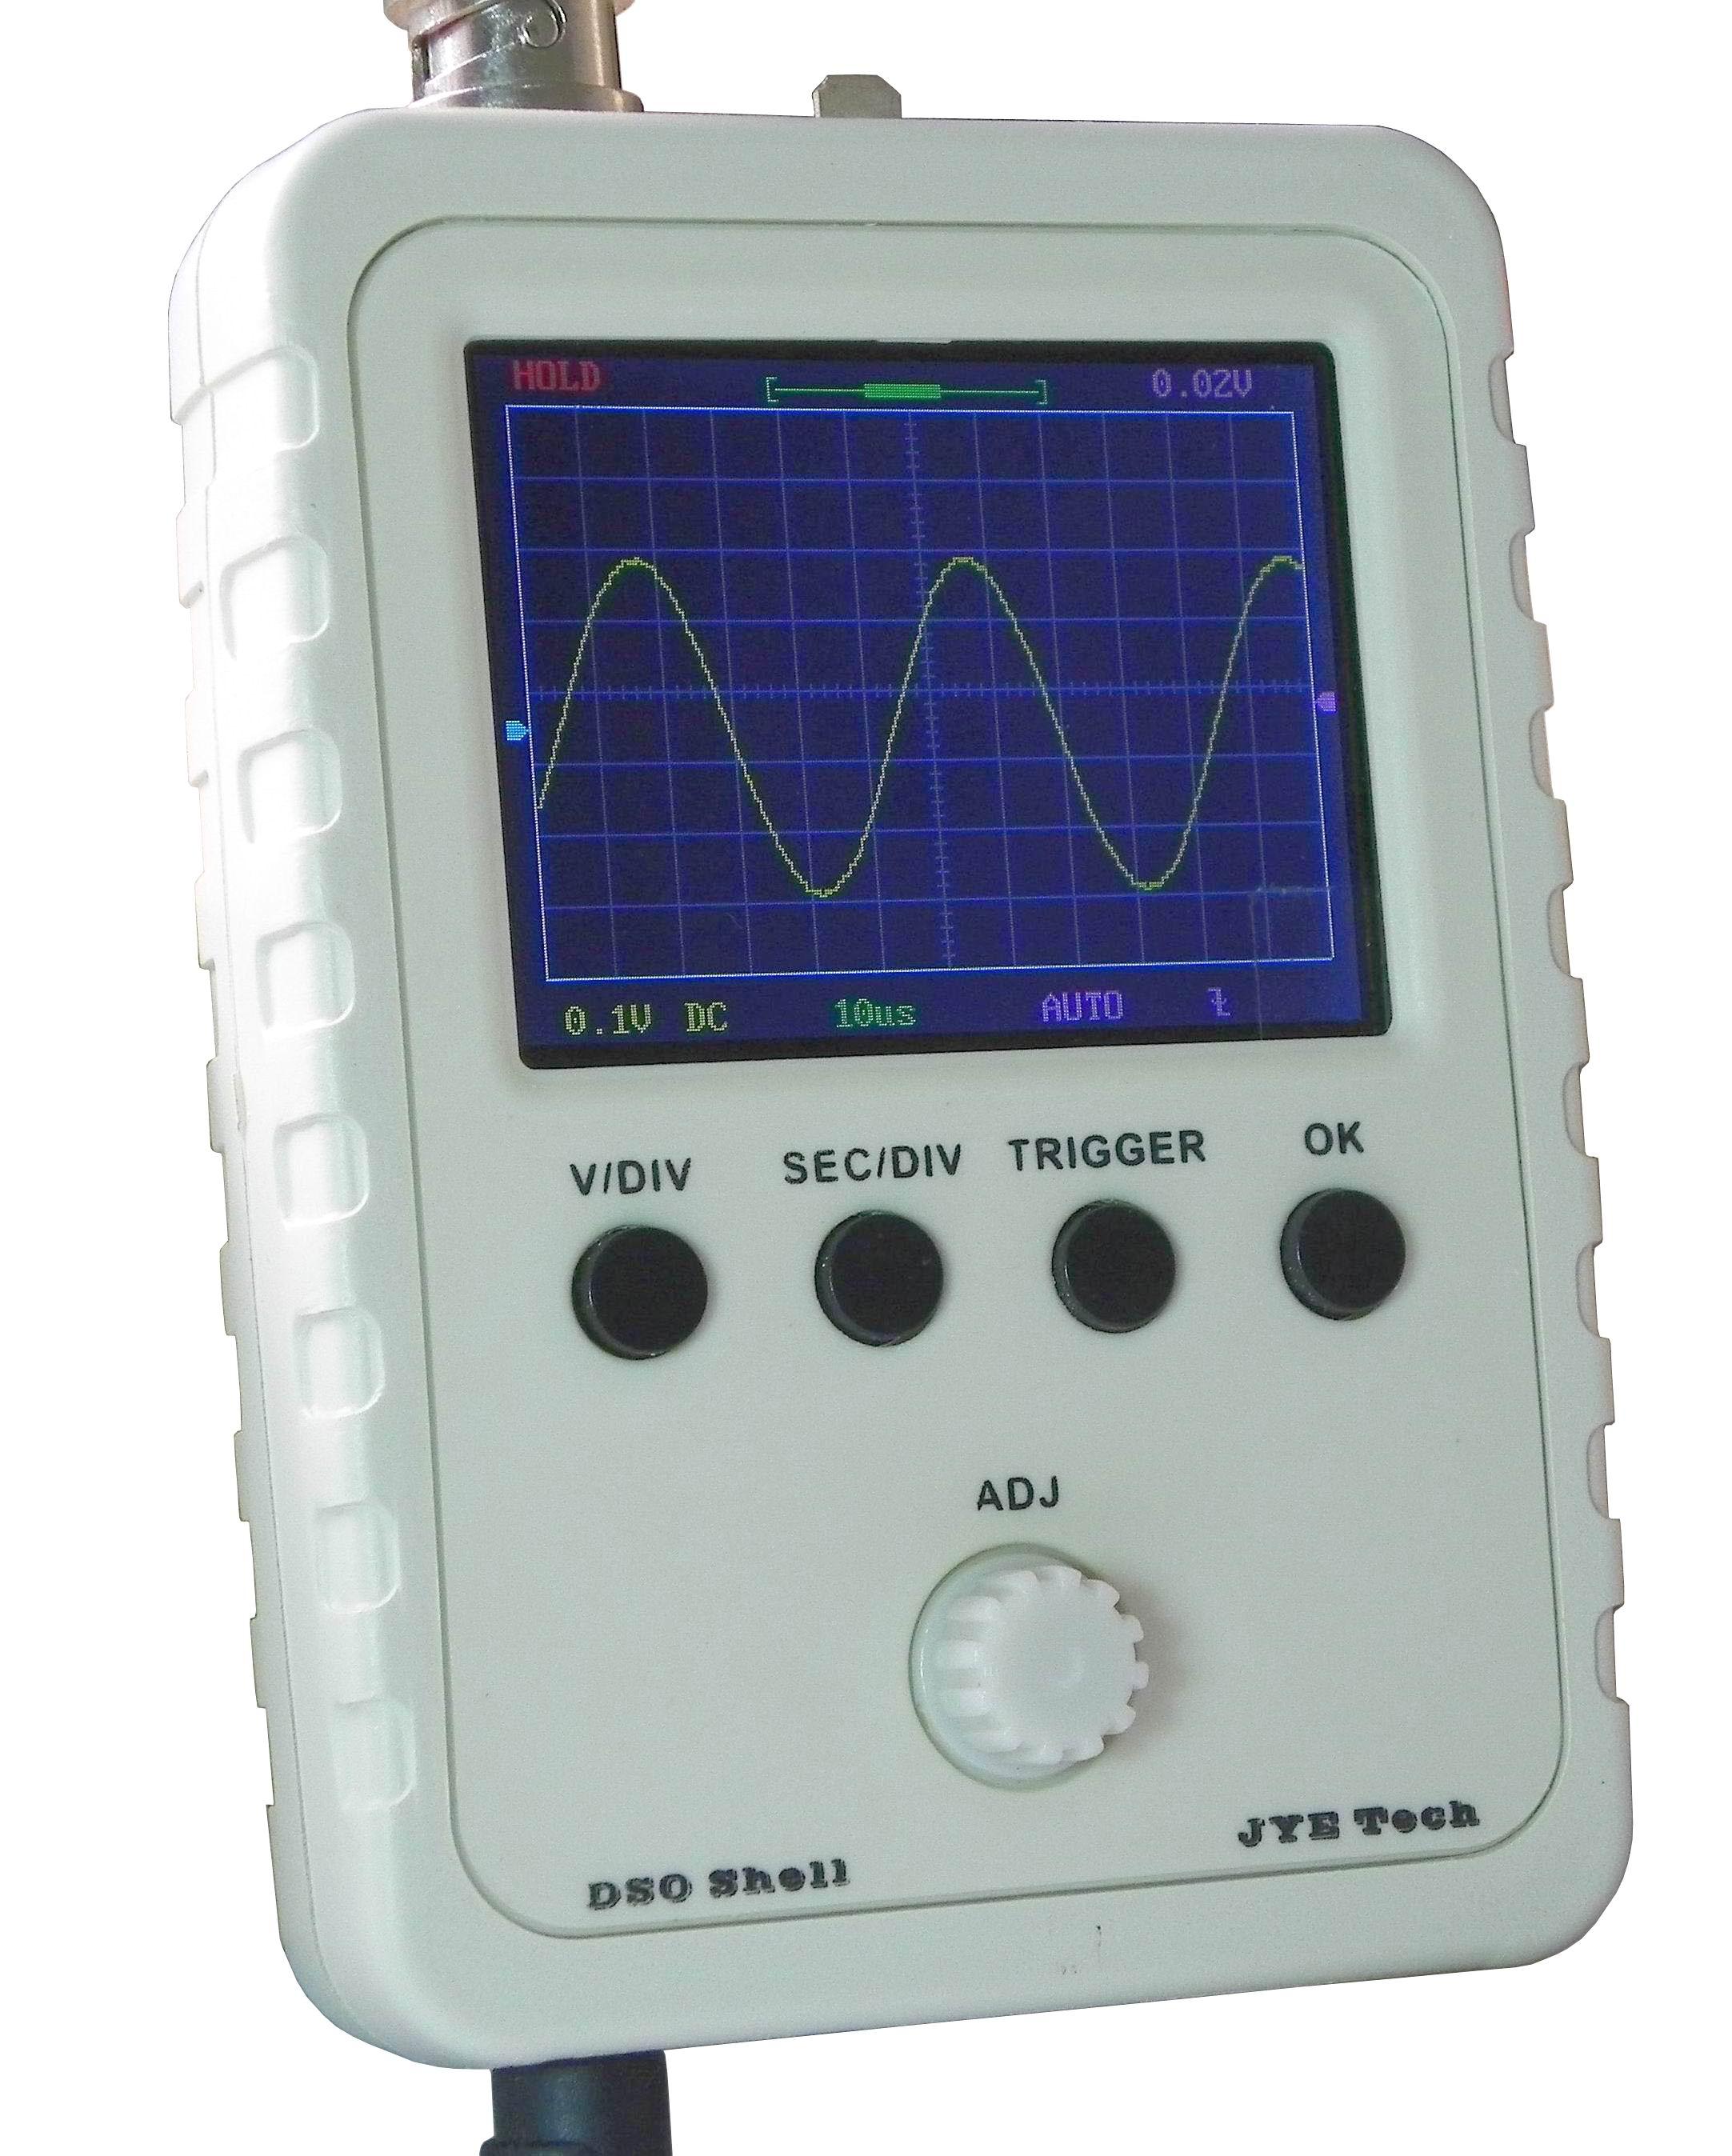 Jye Tech Diy Oscilloscopes Diy Kits For Hobbyists